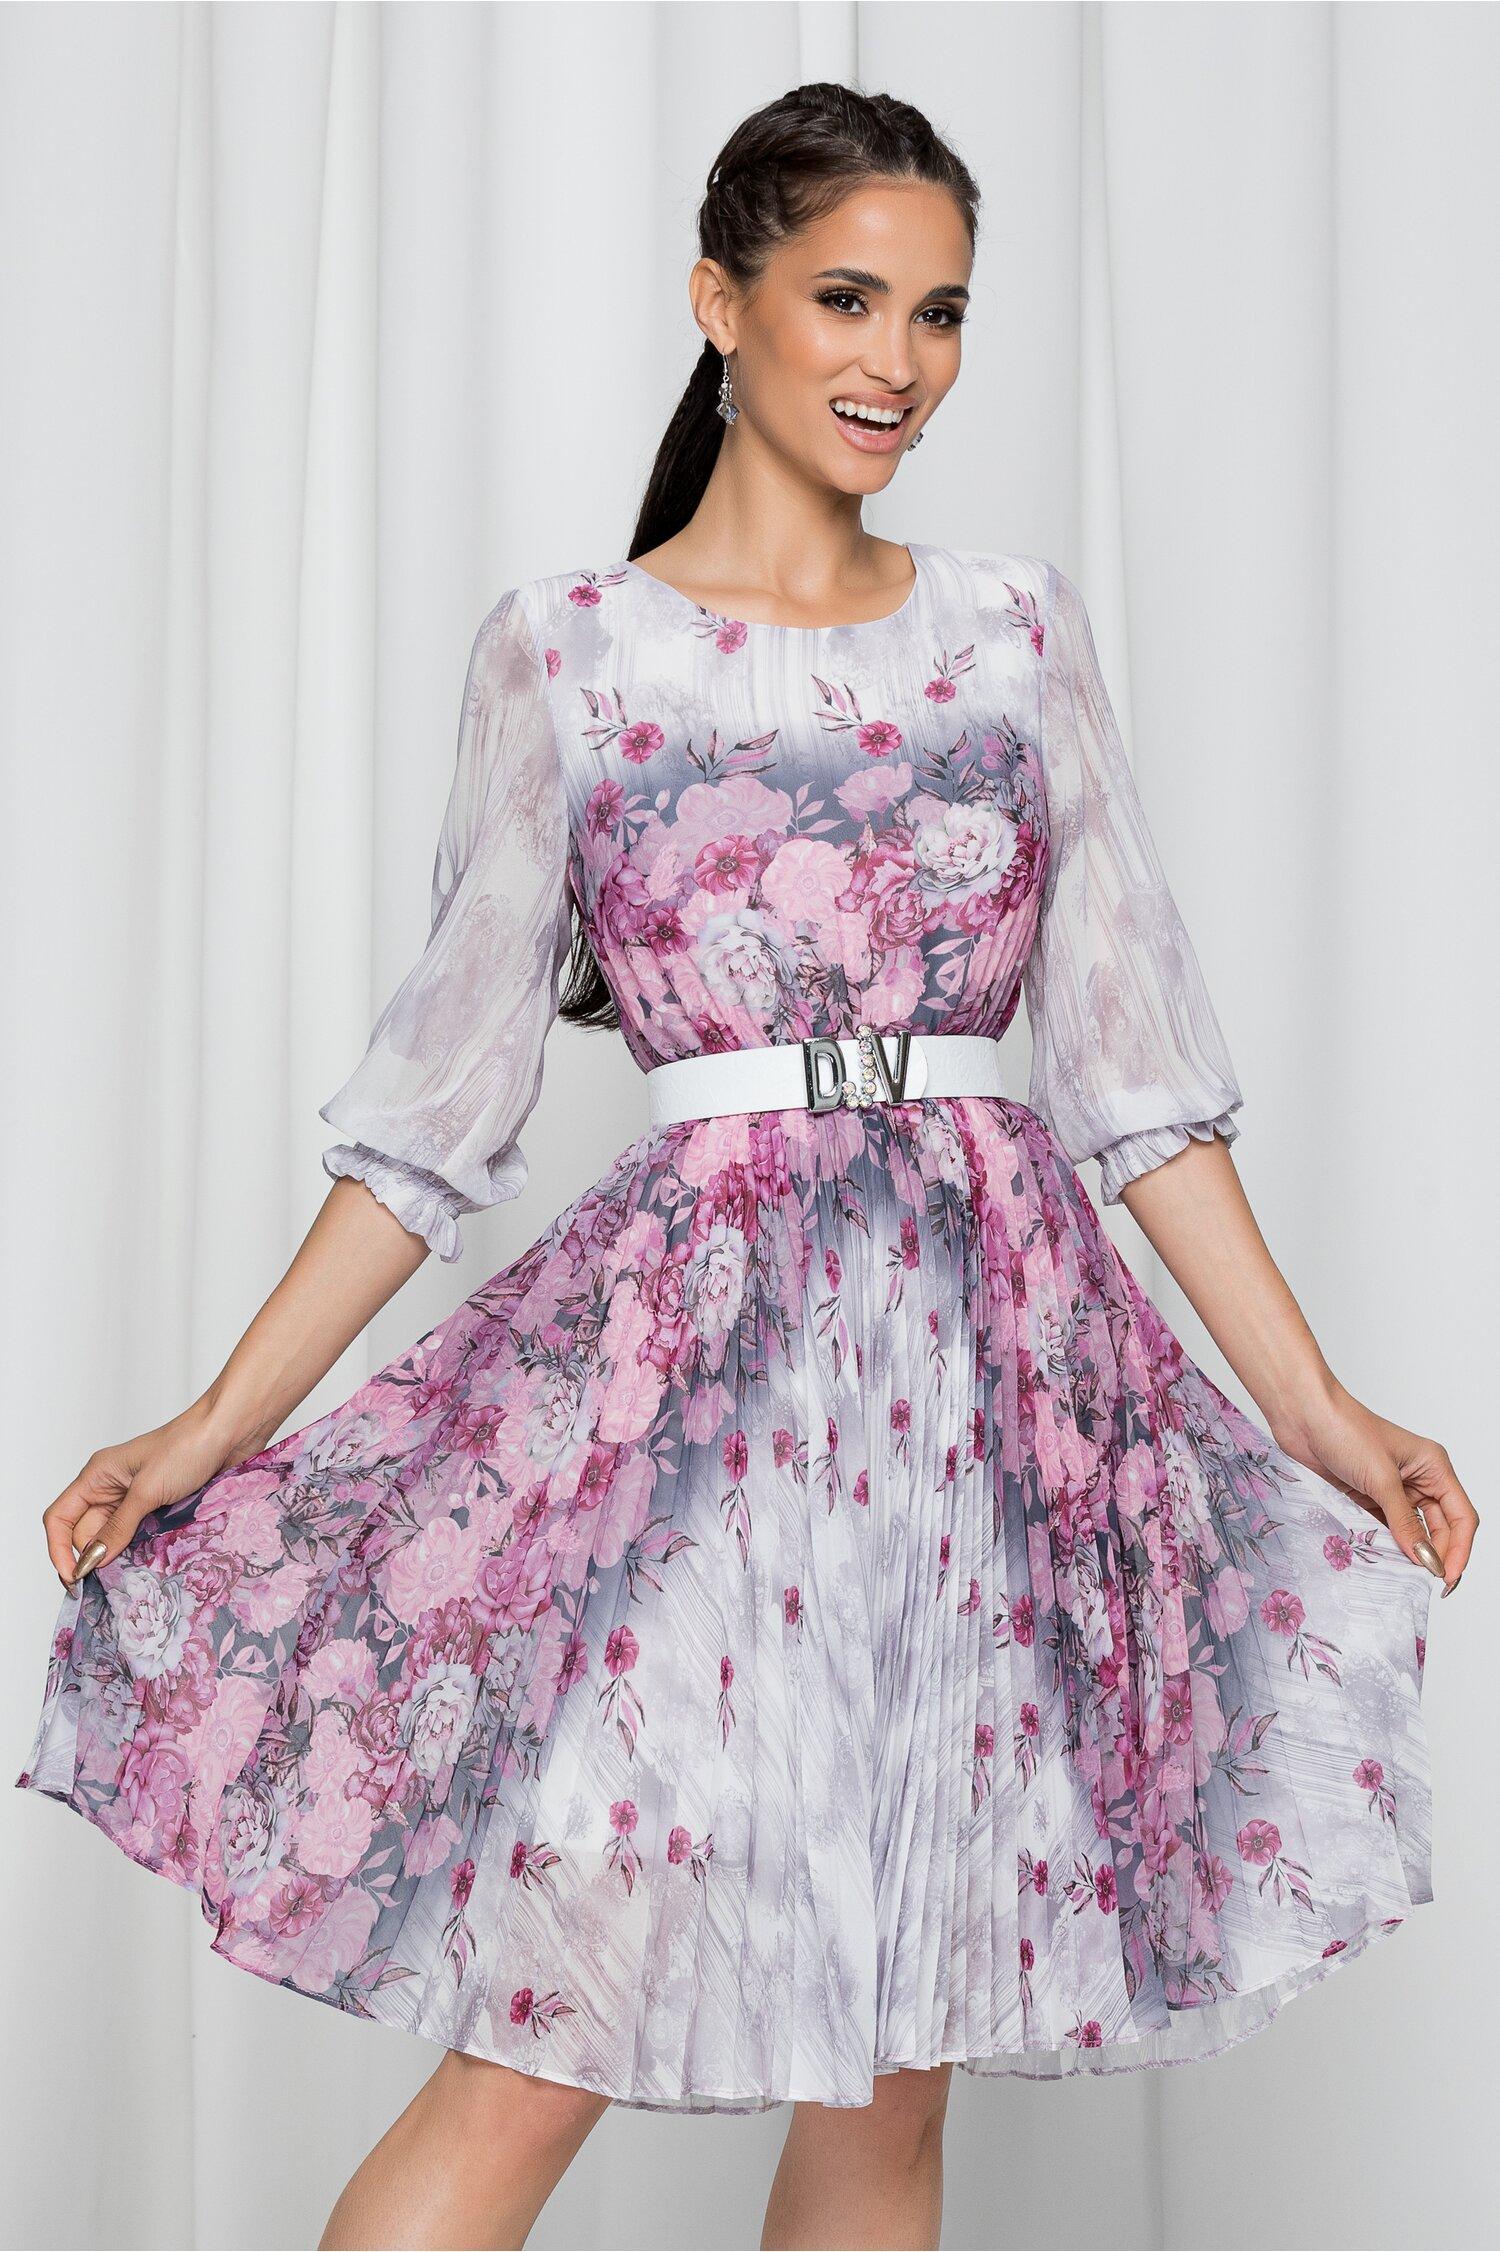 Rochie Jolanda gri cu imprimeu floral si pliuri pe fusta